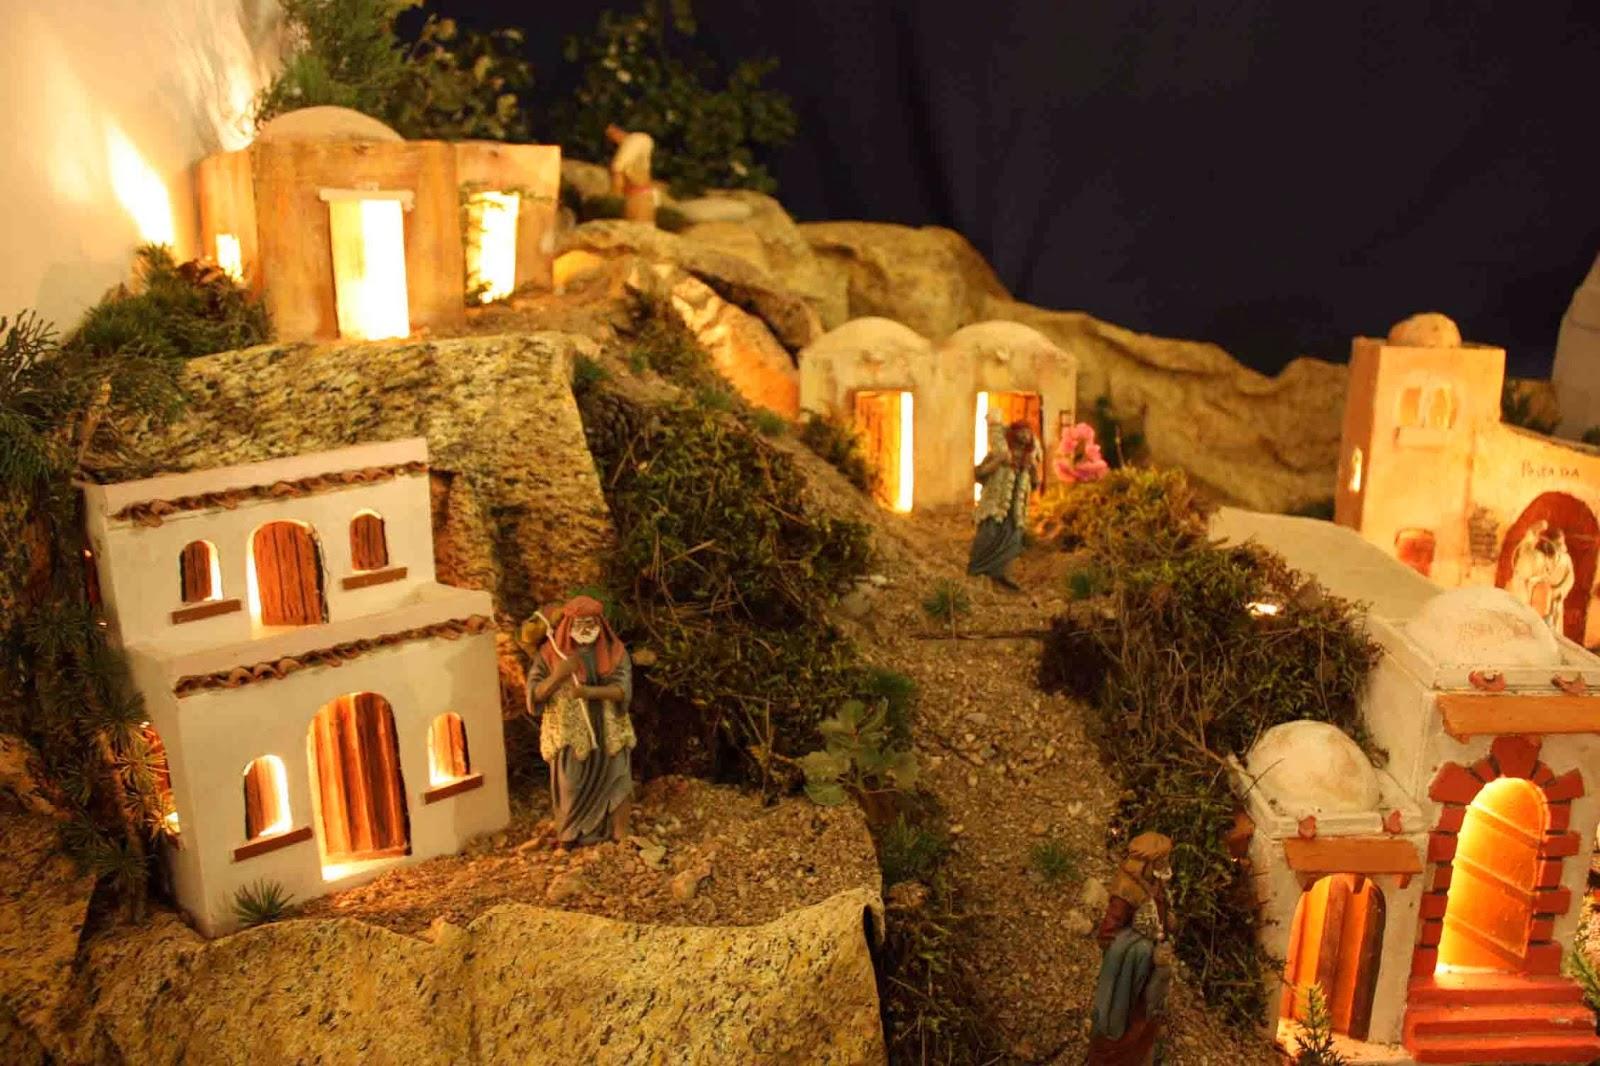 Christmas Village Figures